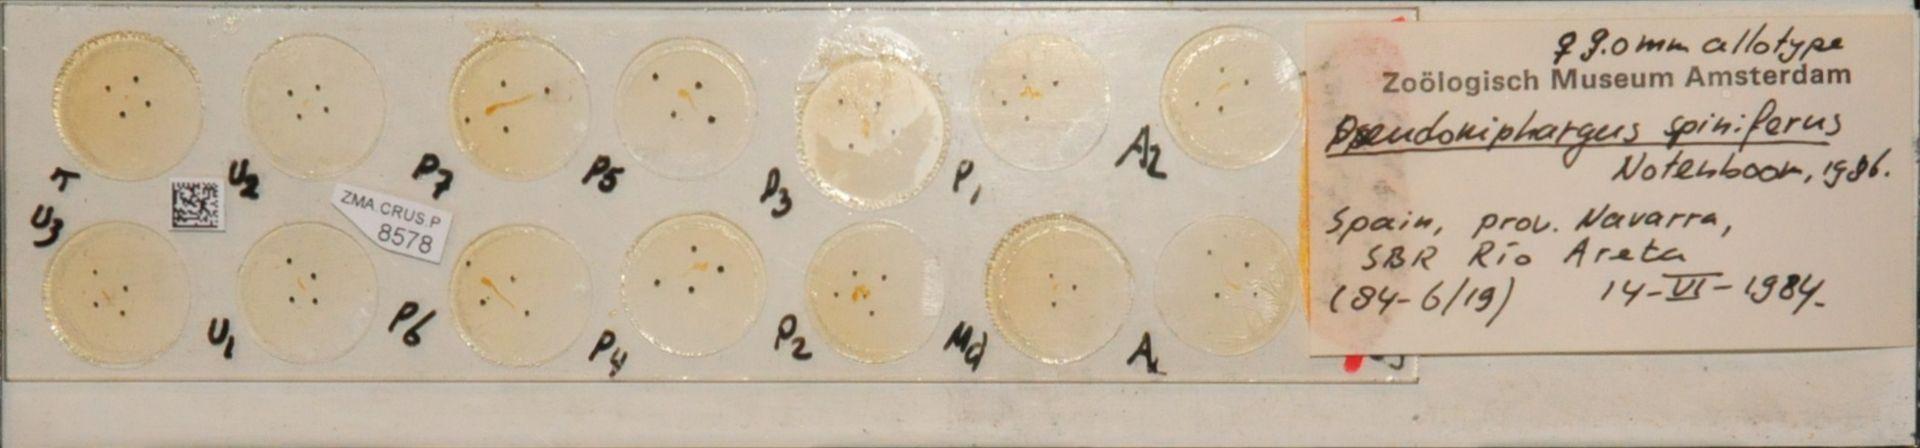 ZMA.CRUS.P.8578 | Pseudoniphargus spiniferus Notenboom, 1986